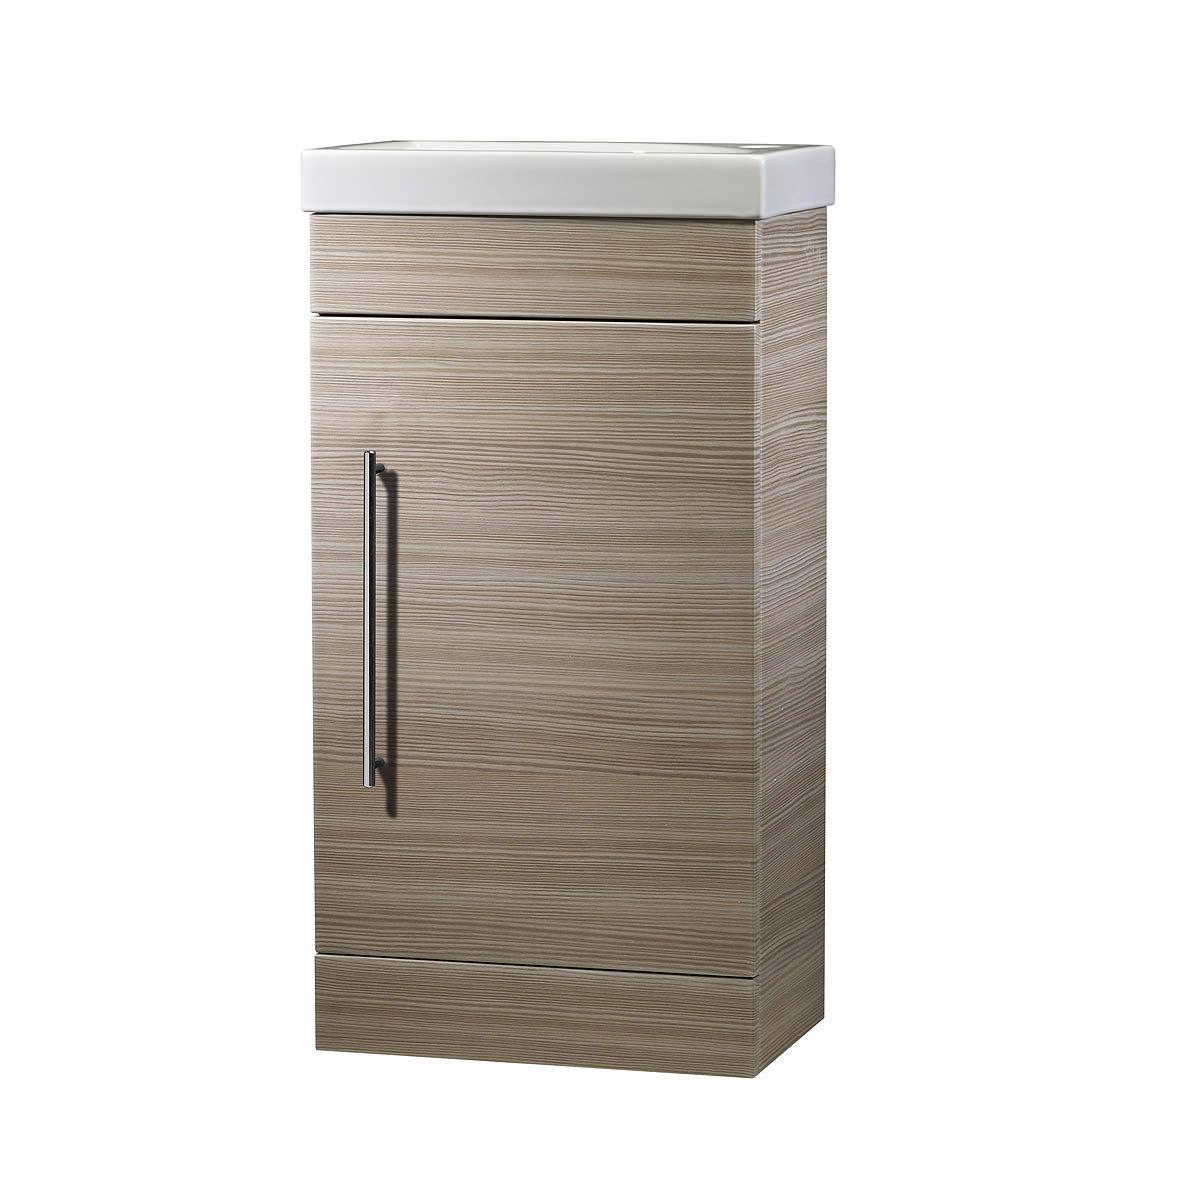 Flat pack bathroom cabinets - Esvb45pd